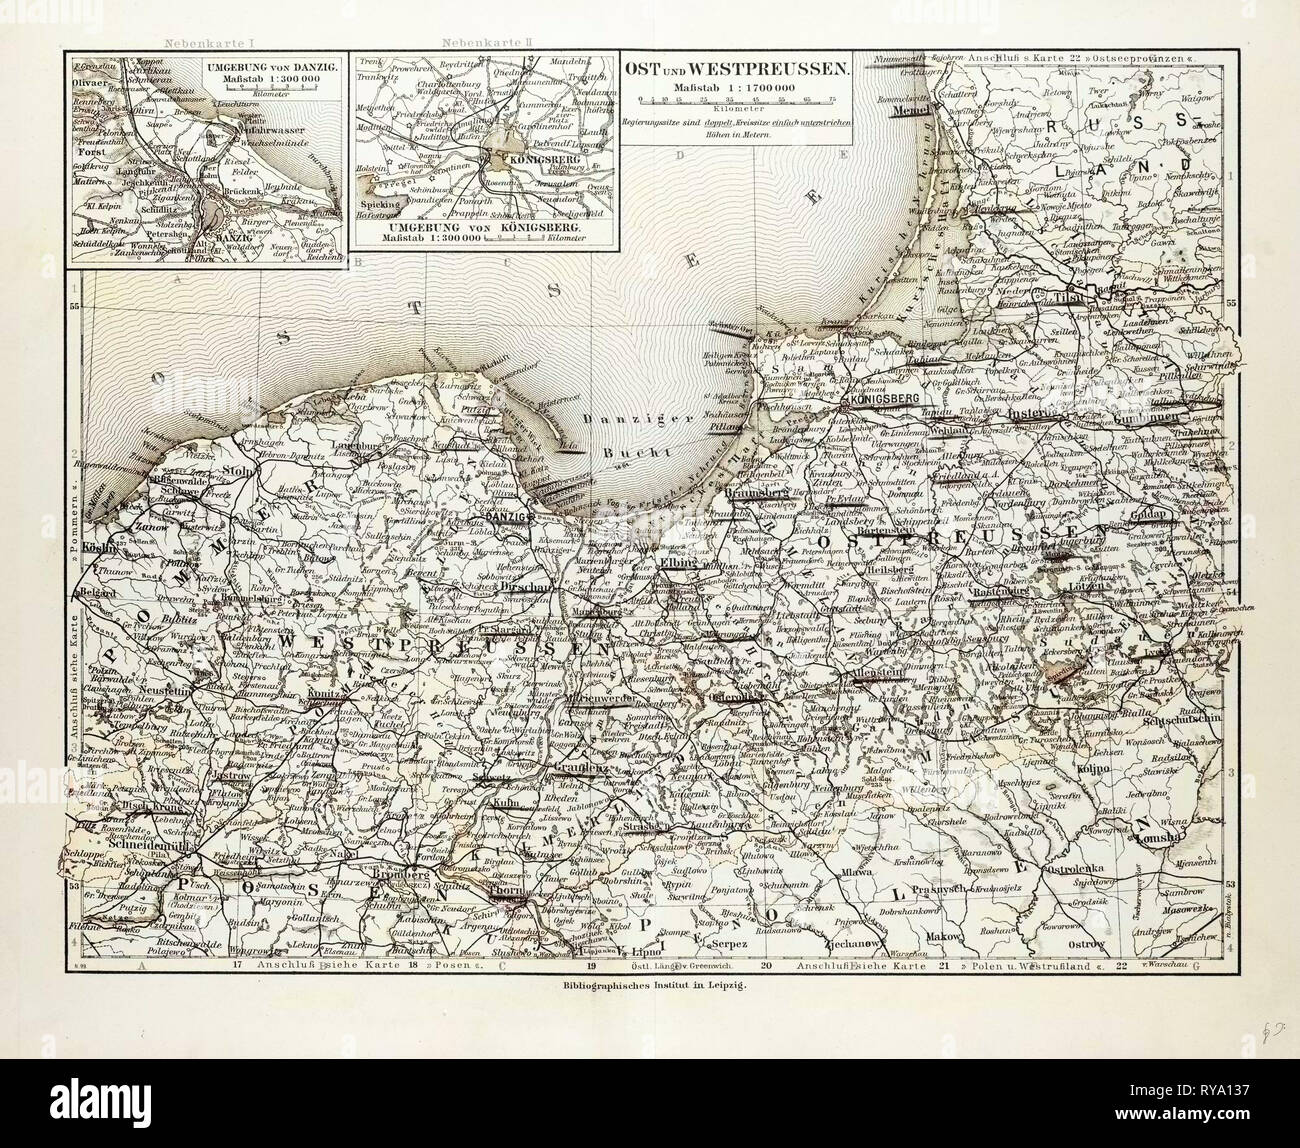 Königsberg Kaliningrad Karte.Konigsberg Map Stock Photos Konigsberg Map Stock Images Alamy